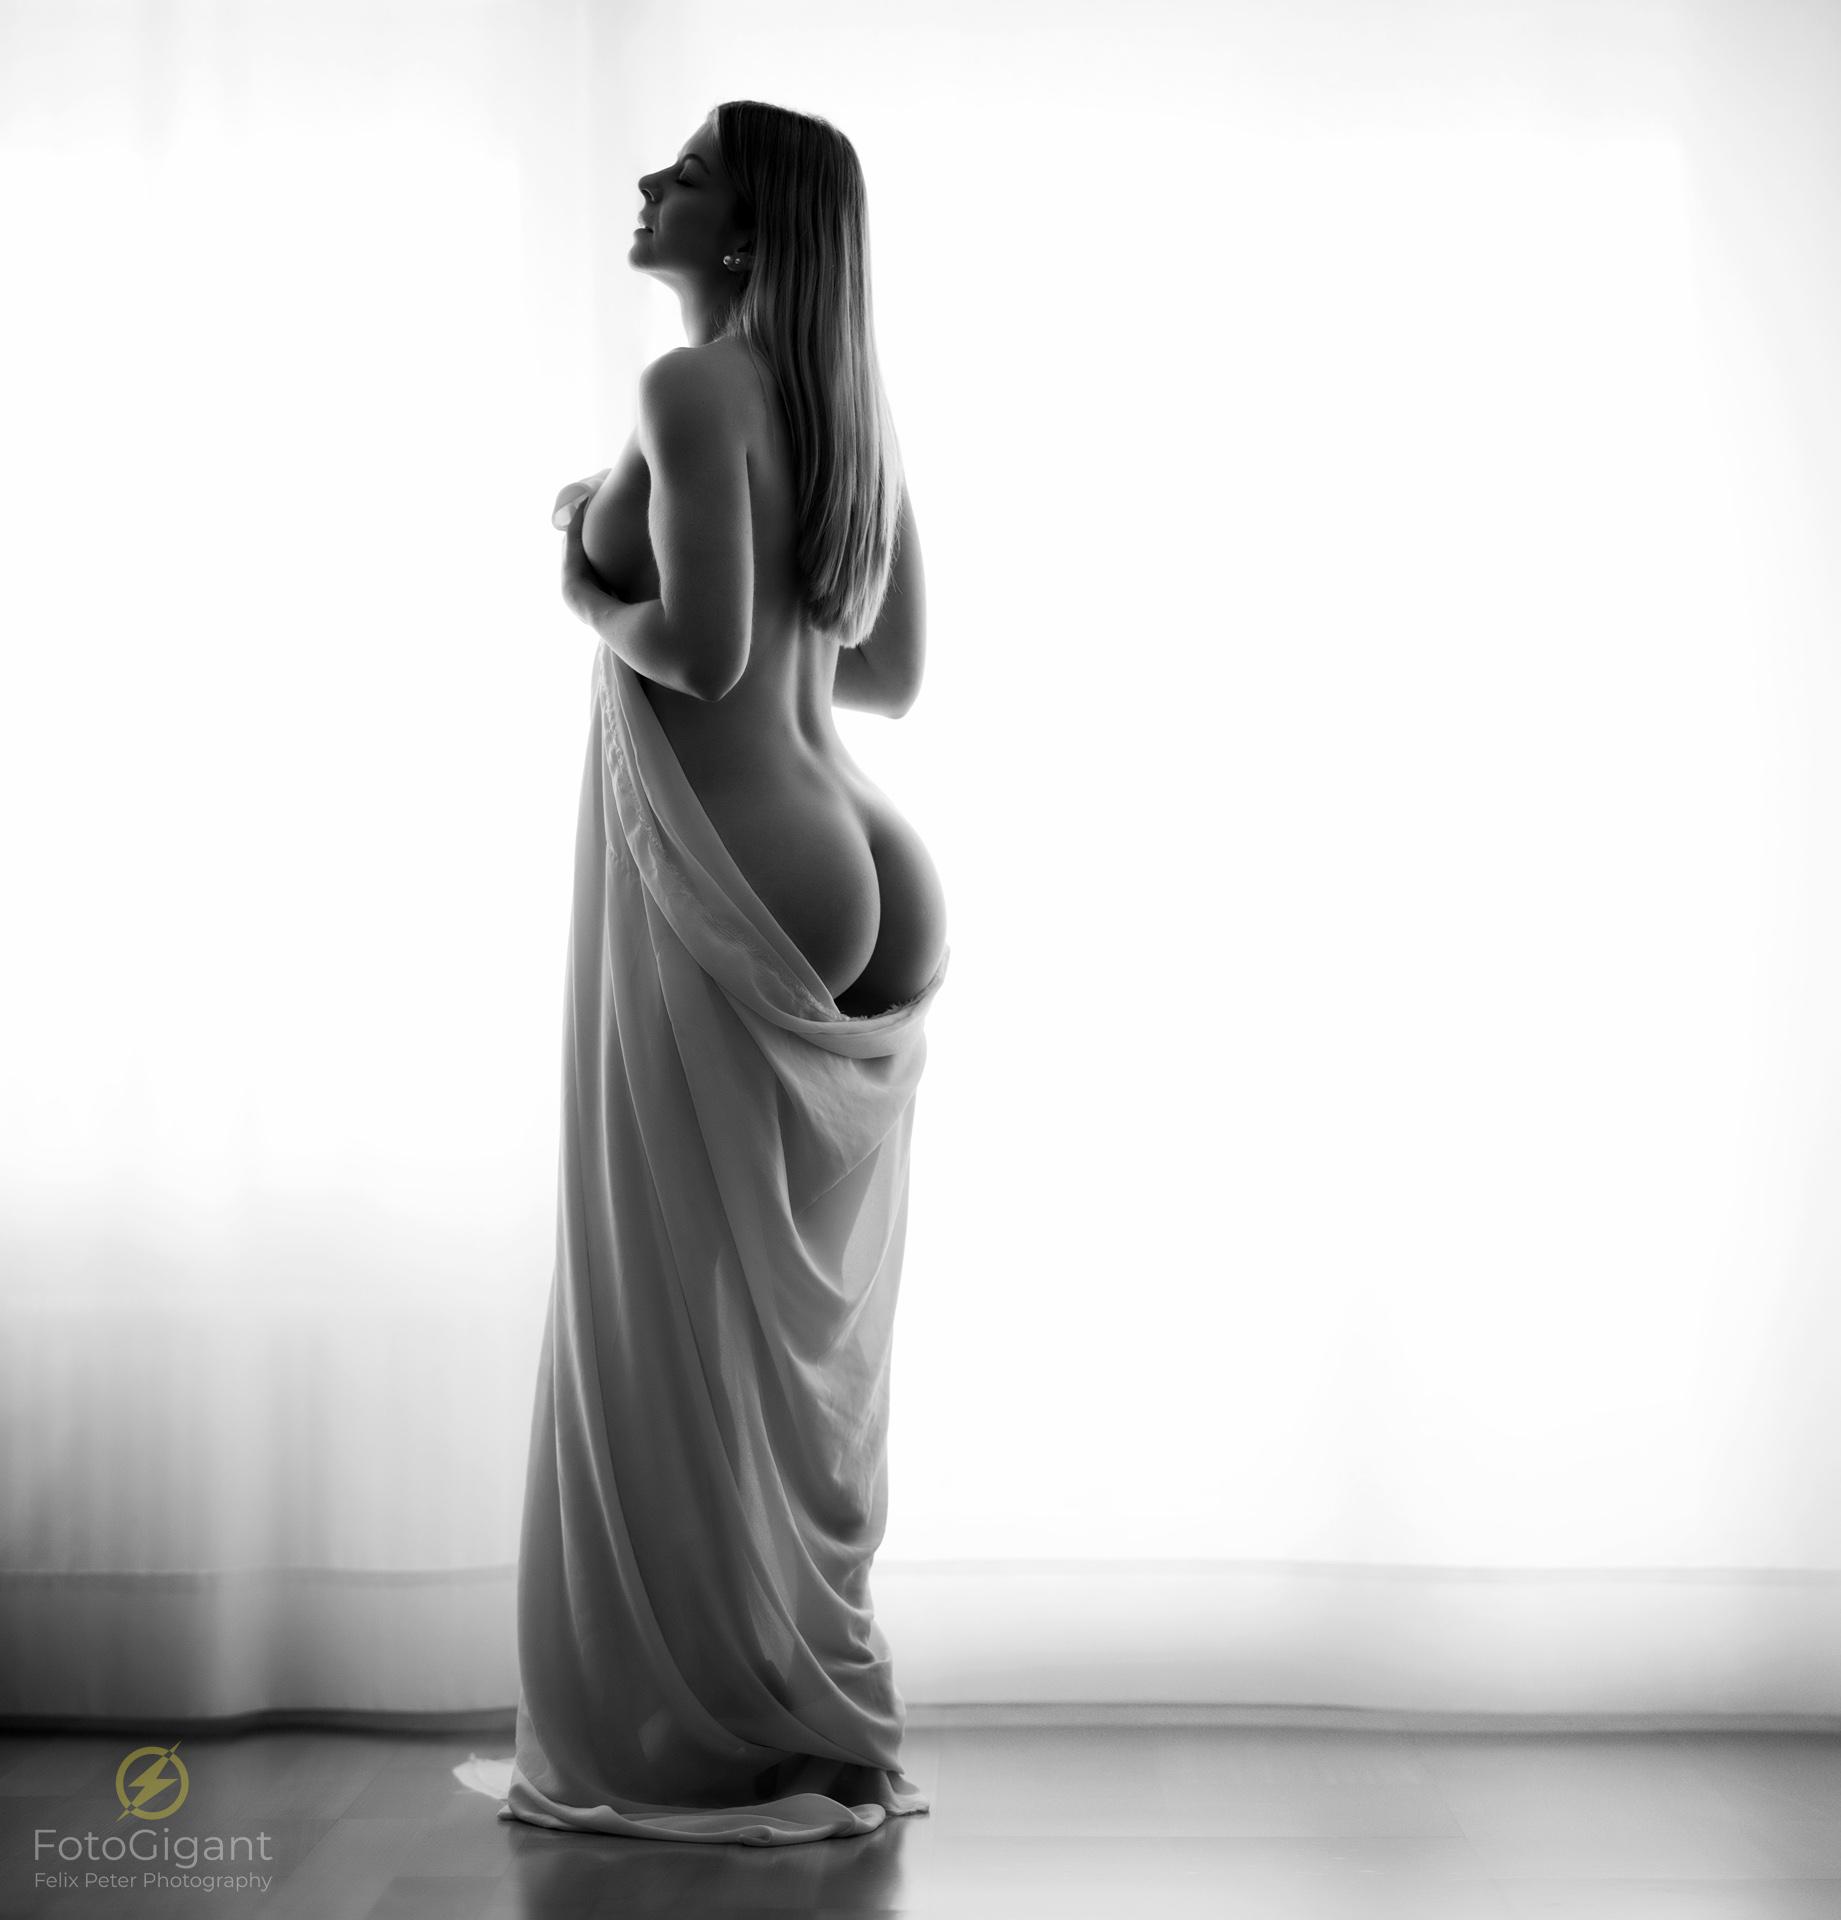 Dessous- & Akt-Fotoshootings... - ...im Fotostudio Worb / Bern von Felix Peter Photography